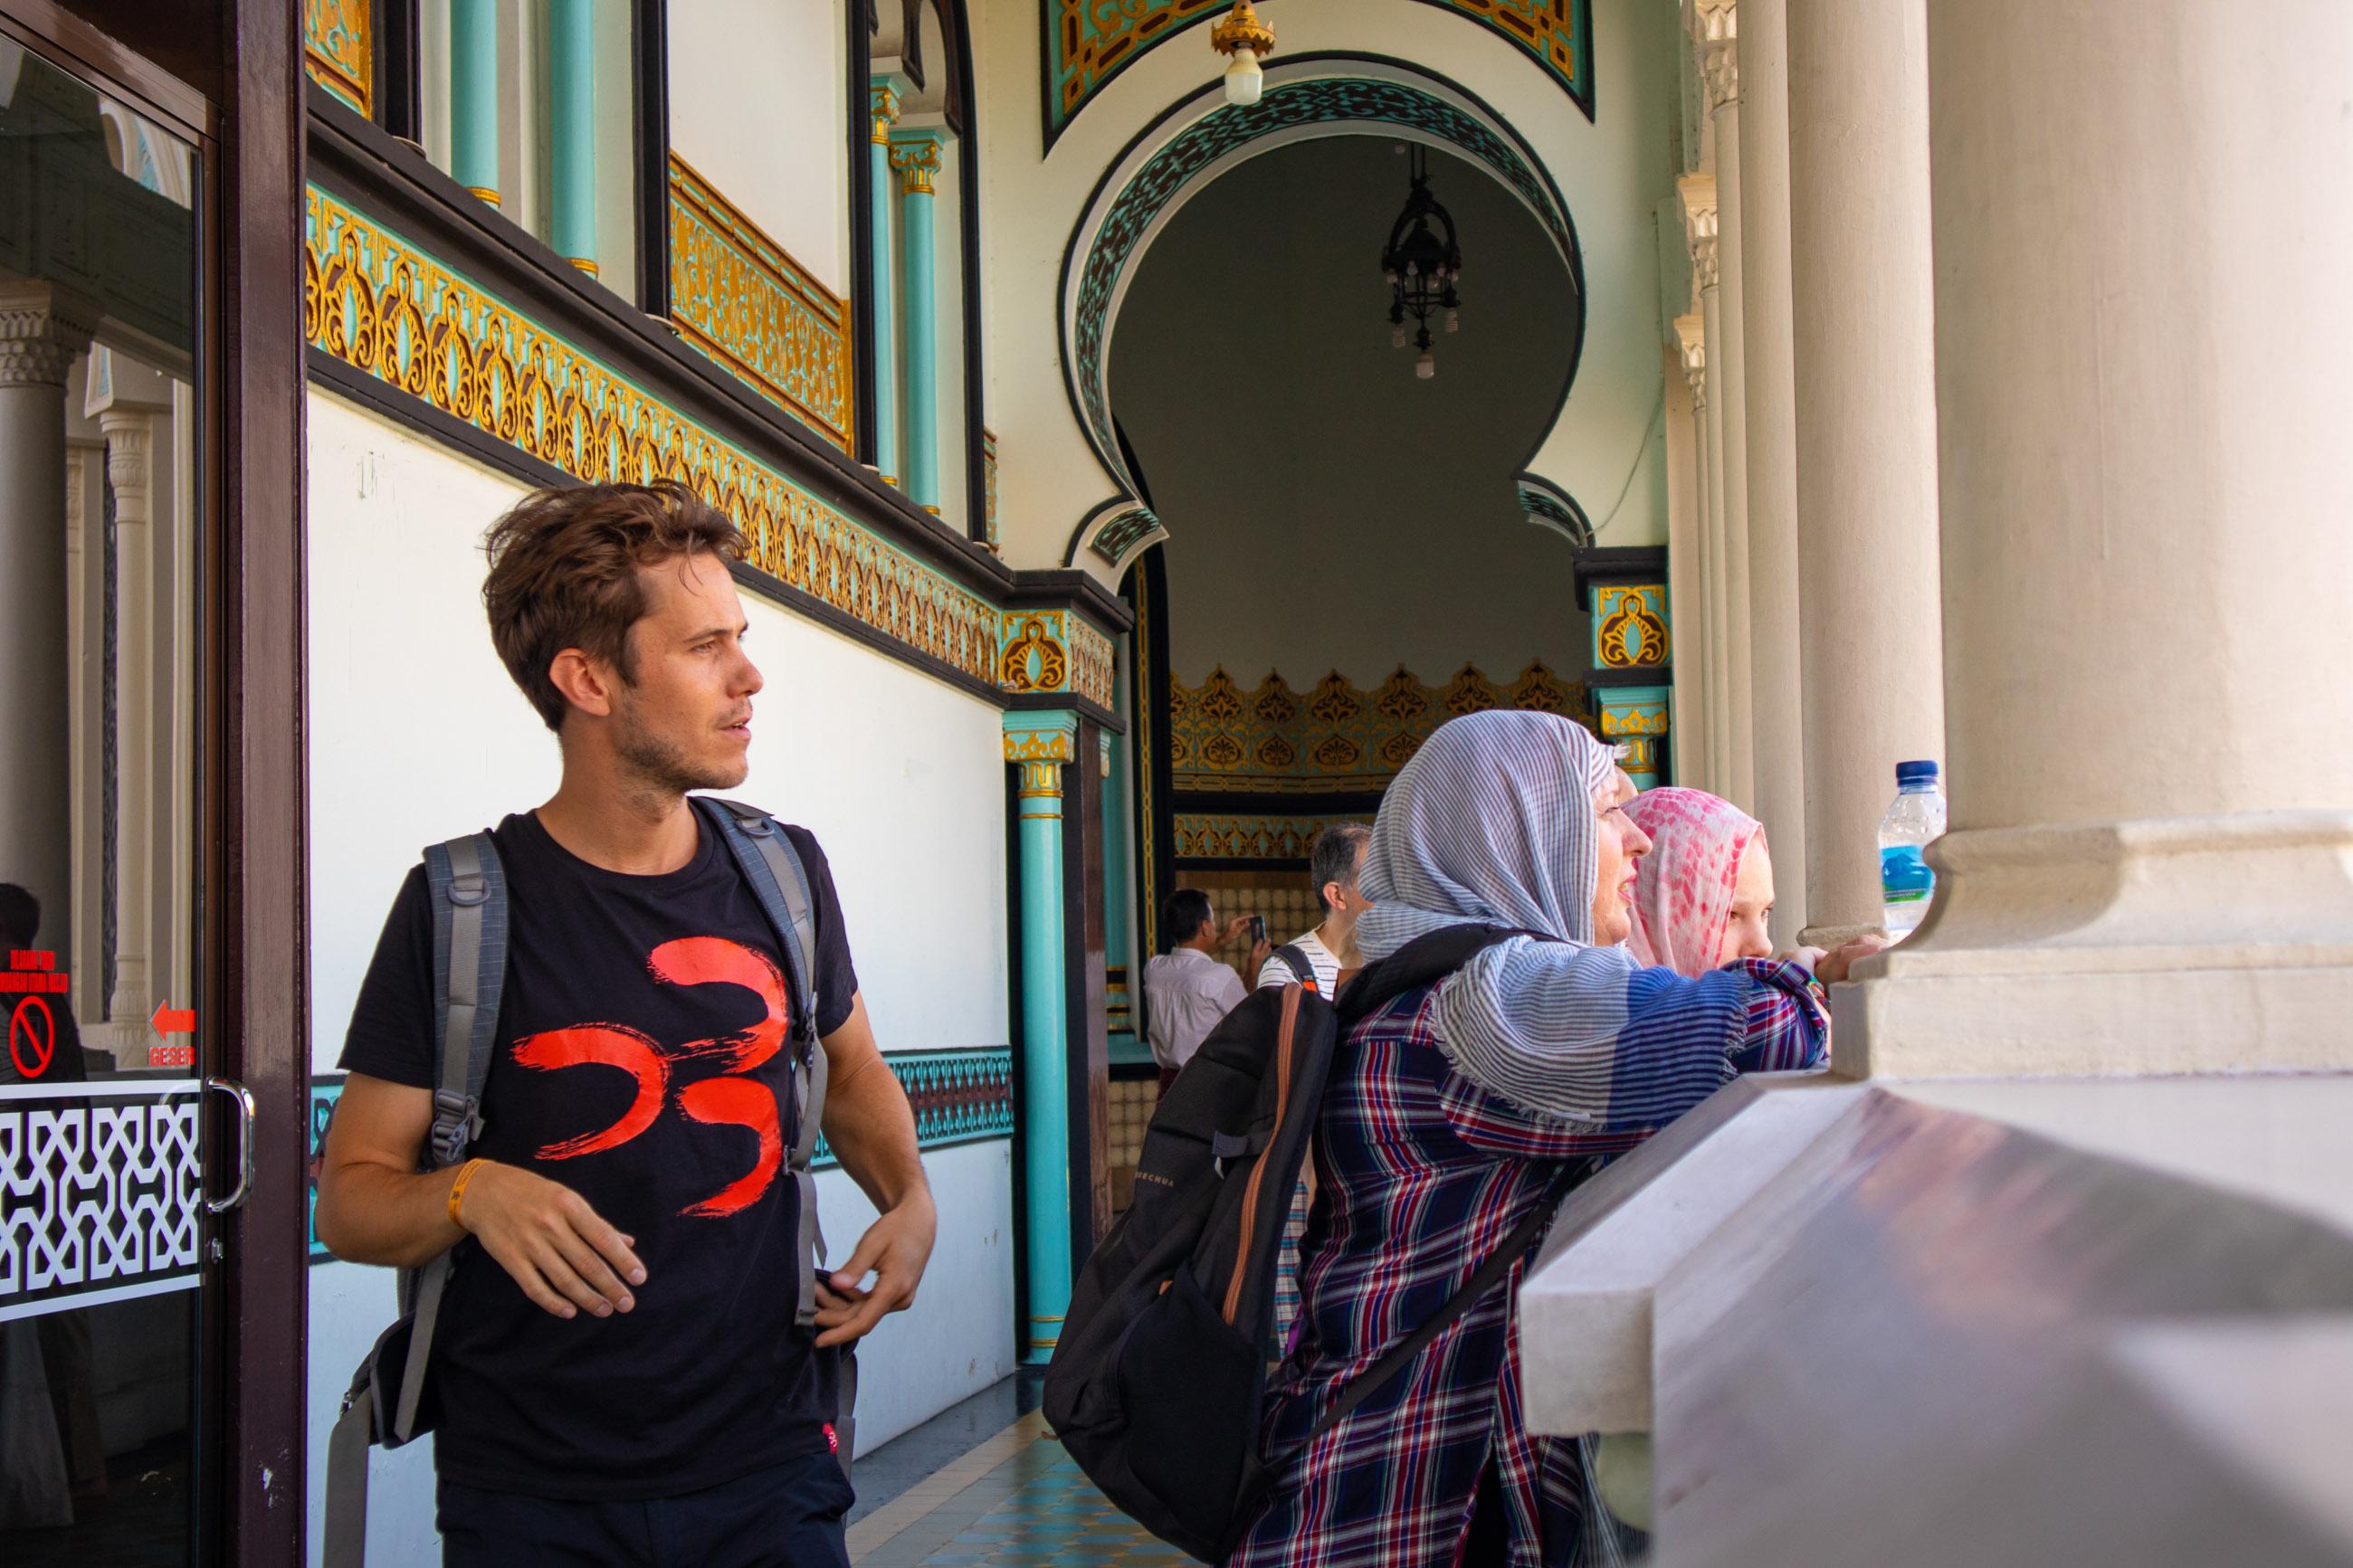 https://bubo.sk/uploads/galleries/7396/tomashornak_indonezia_sumatra_img_0016-1-47.jpg